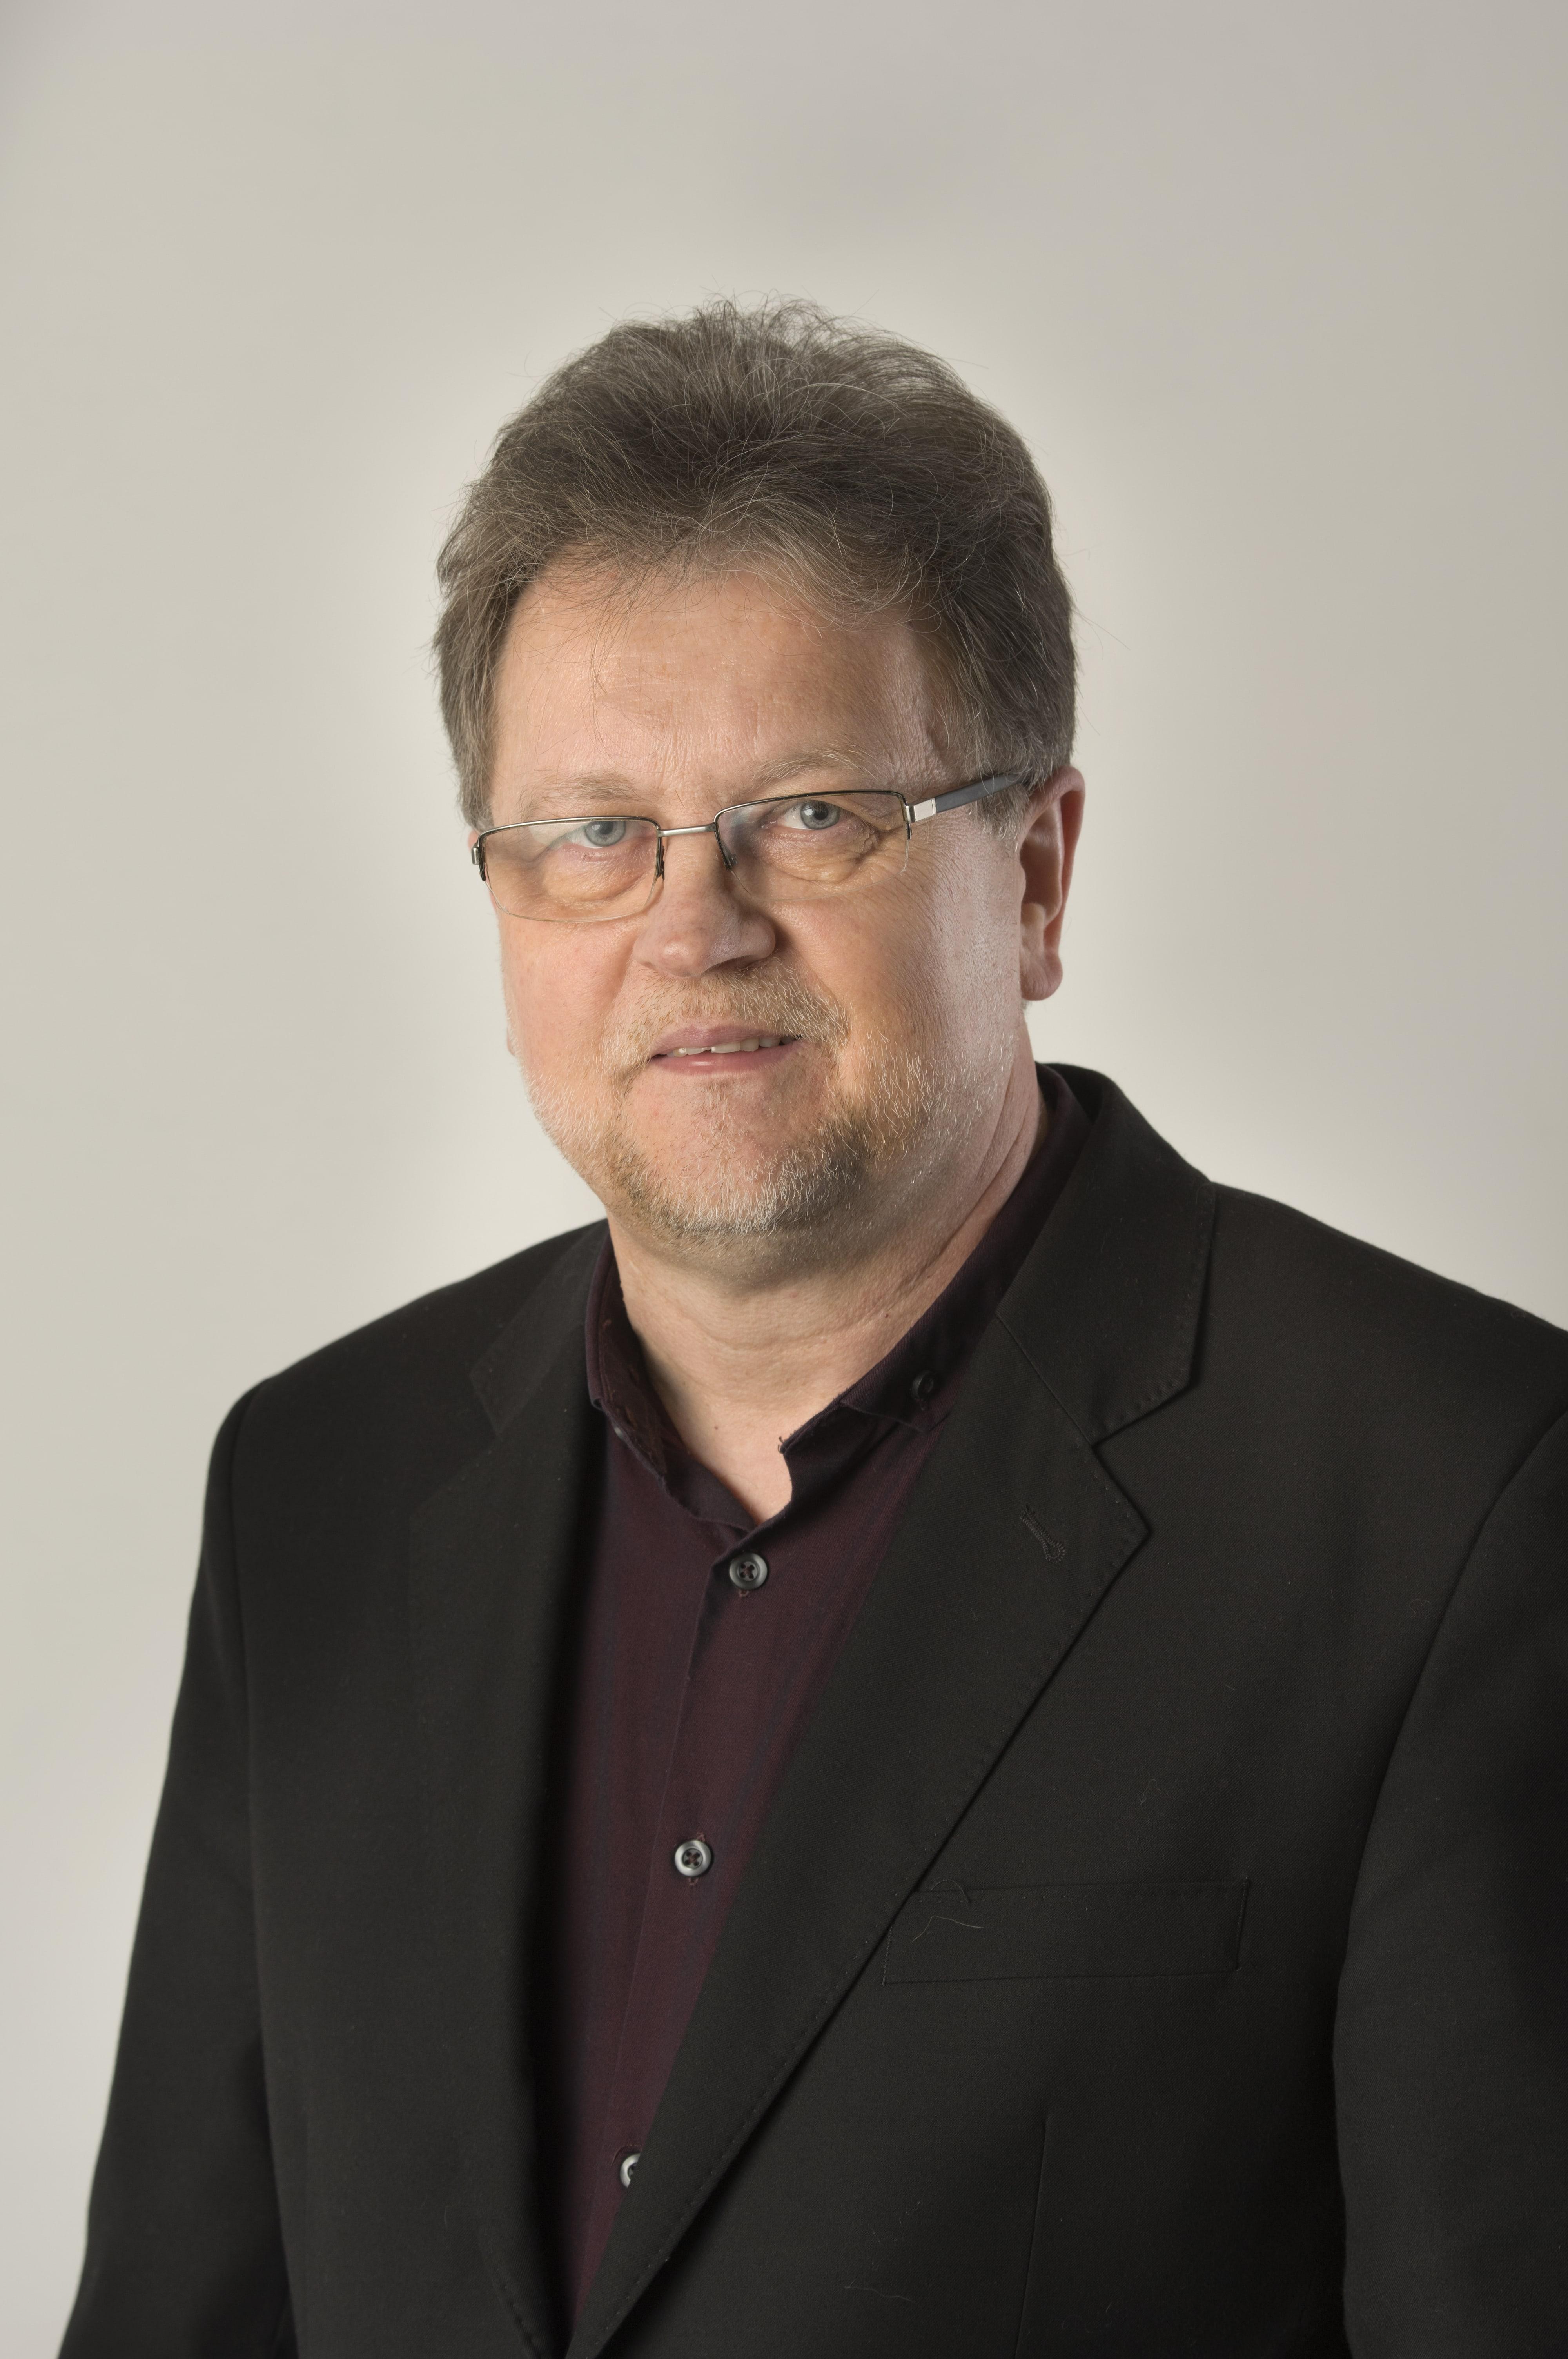 Andrzej Tuderek